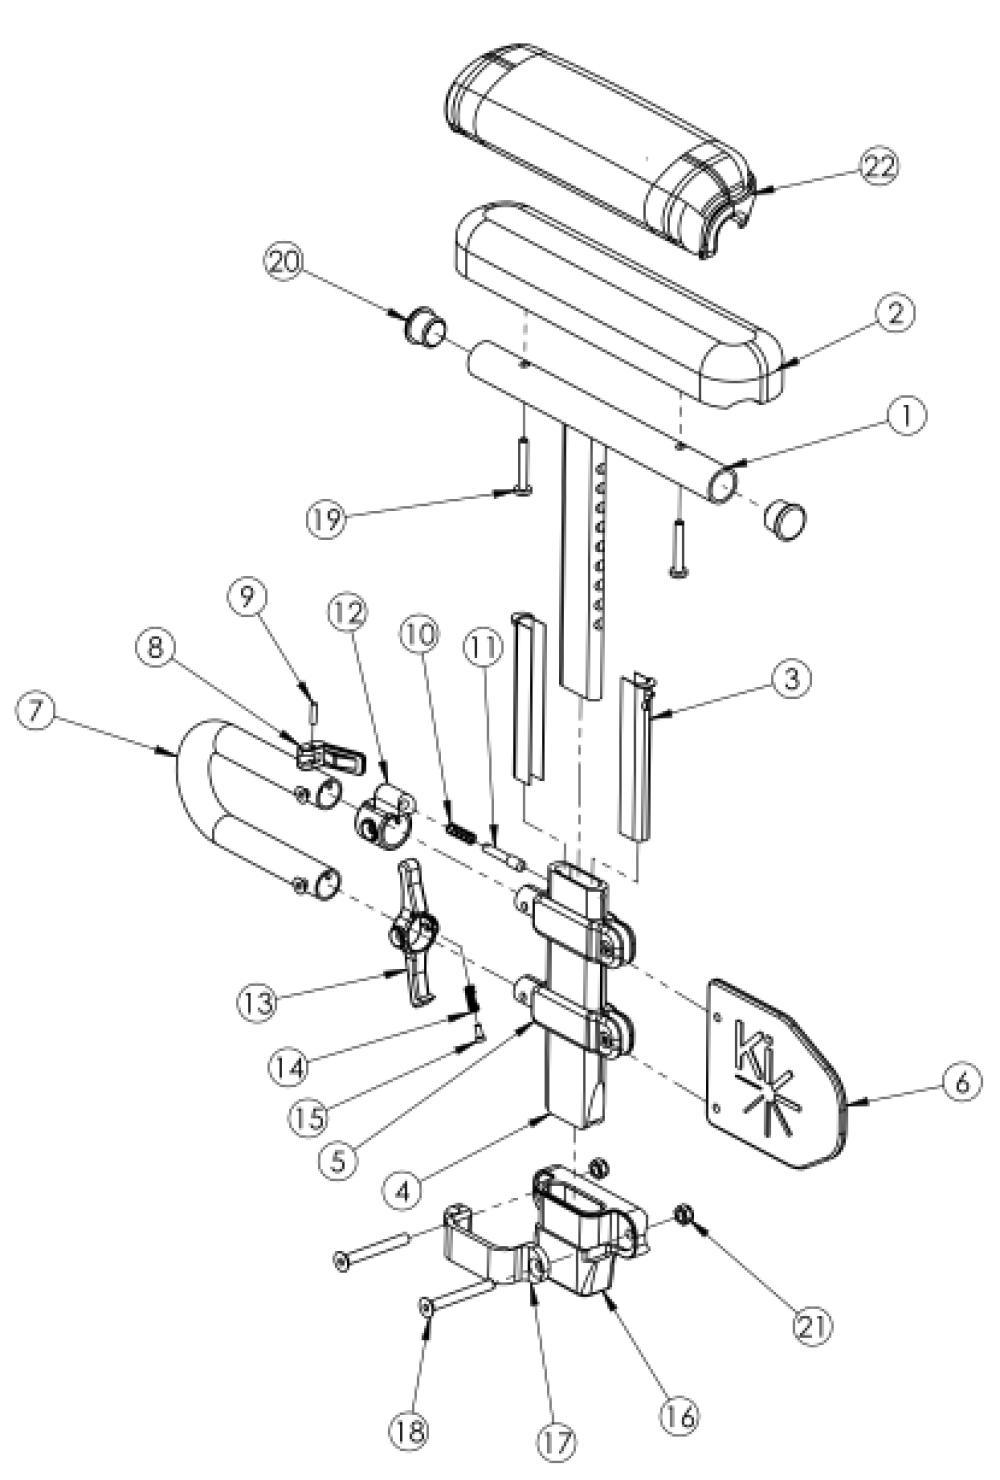 Rogue / Rogue Xp Height Adjustable Low T-arm parts diagram